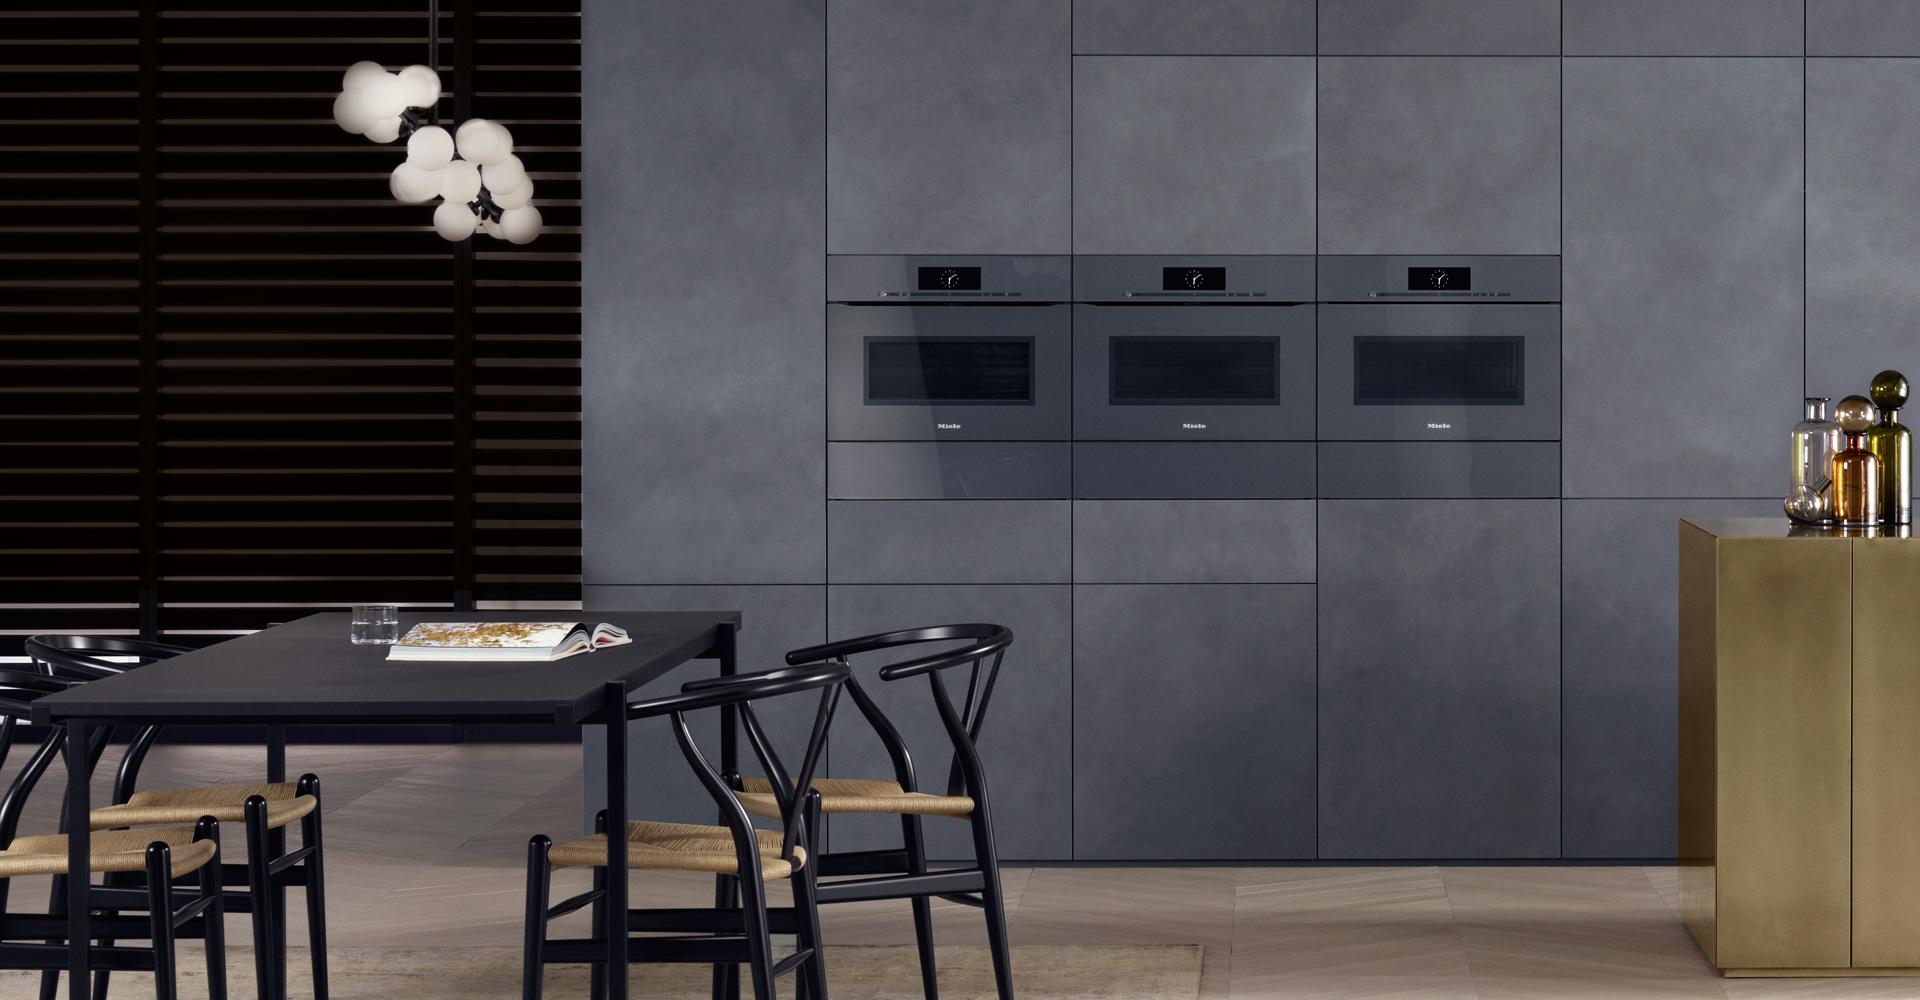 Kitchen Appliances That Do Everything